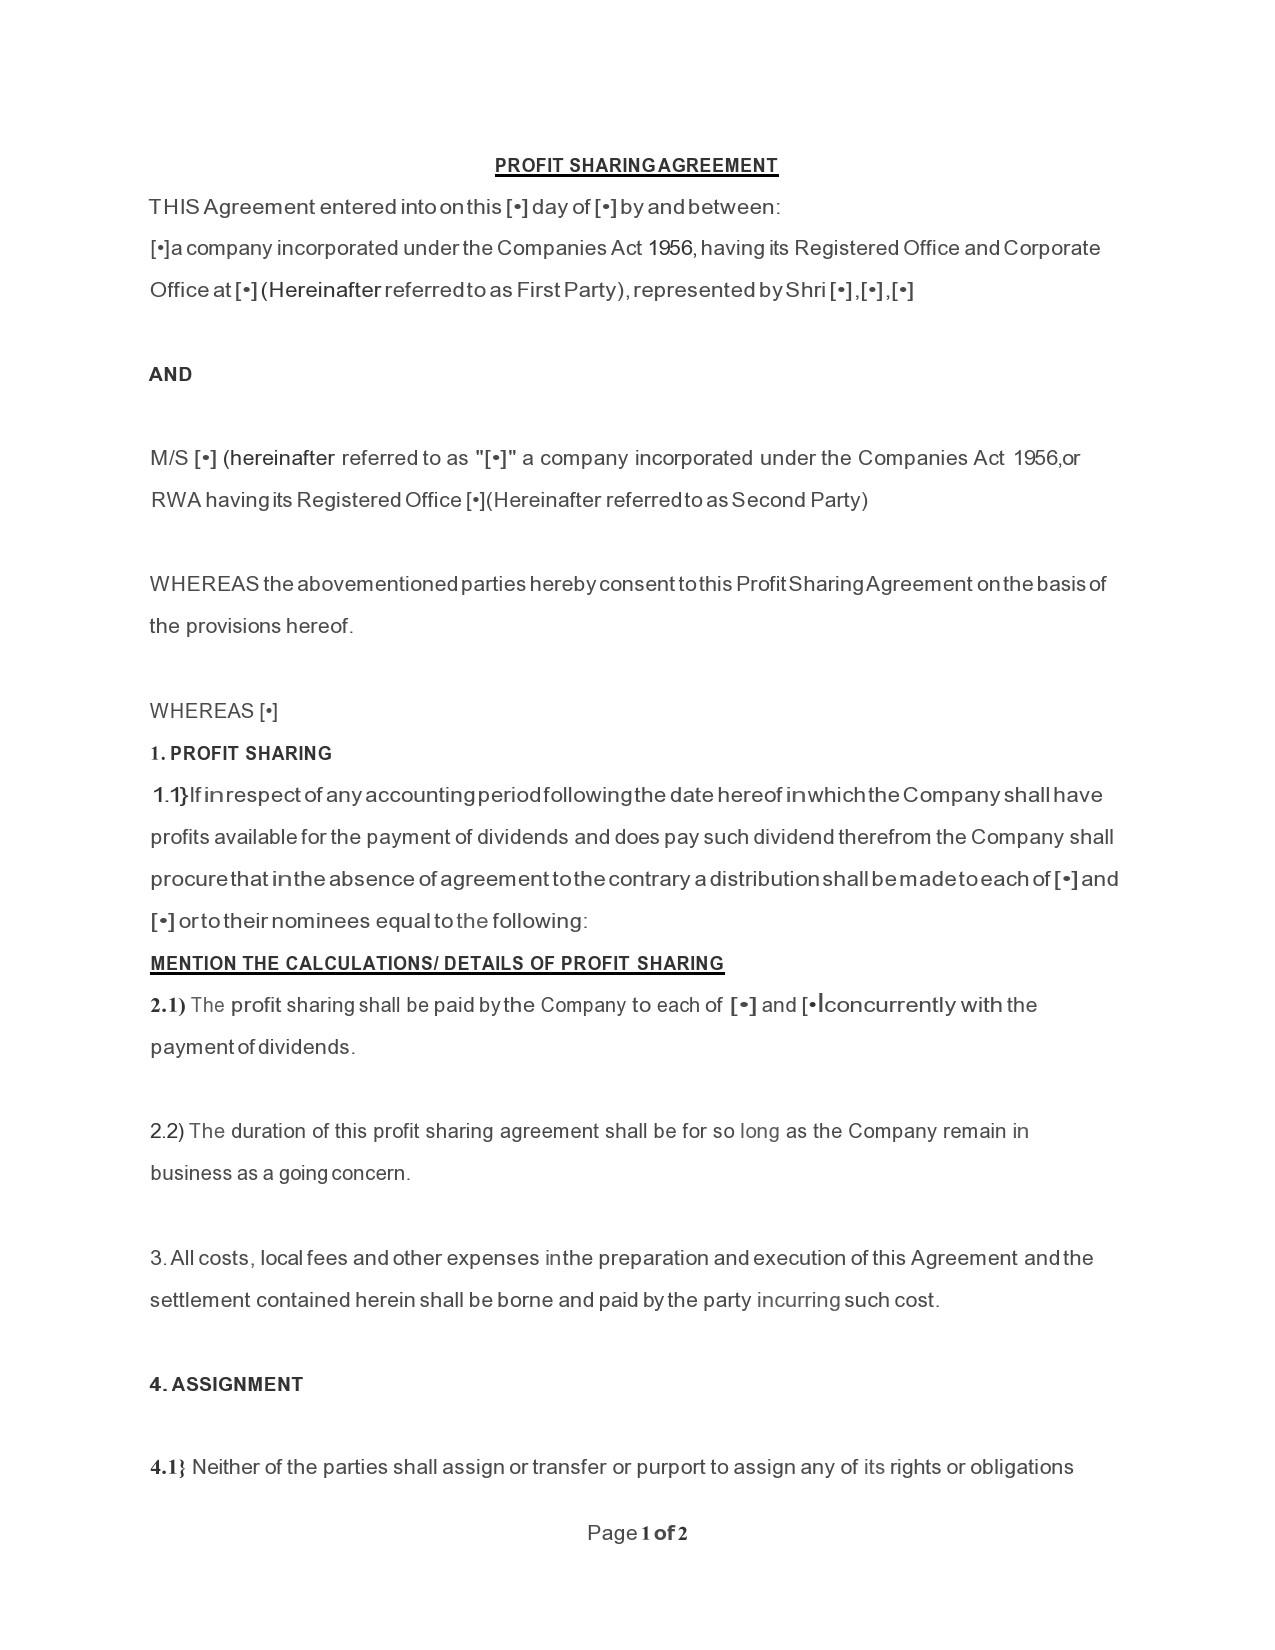 Free profit sharing agreement 17